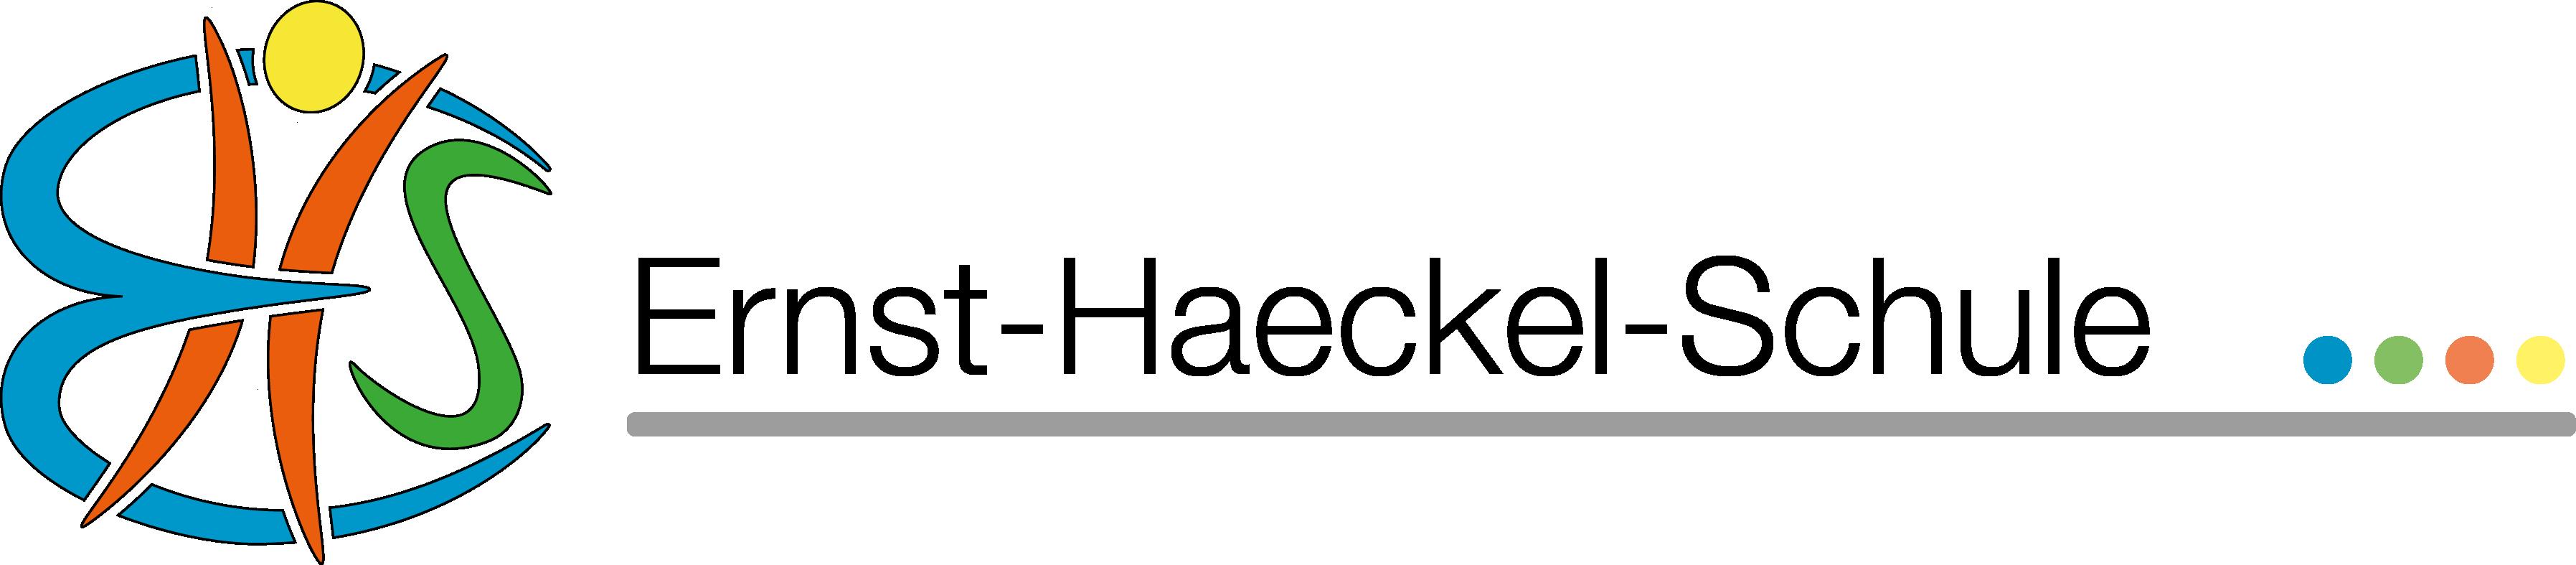 Haeckel-Schule Logo